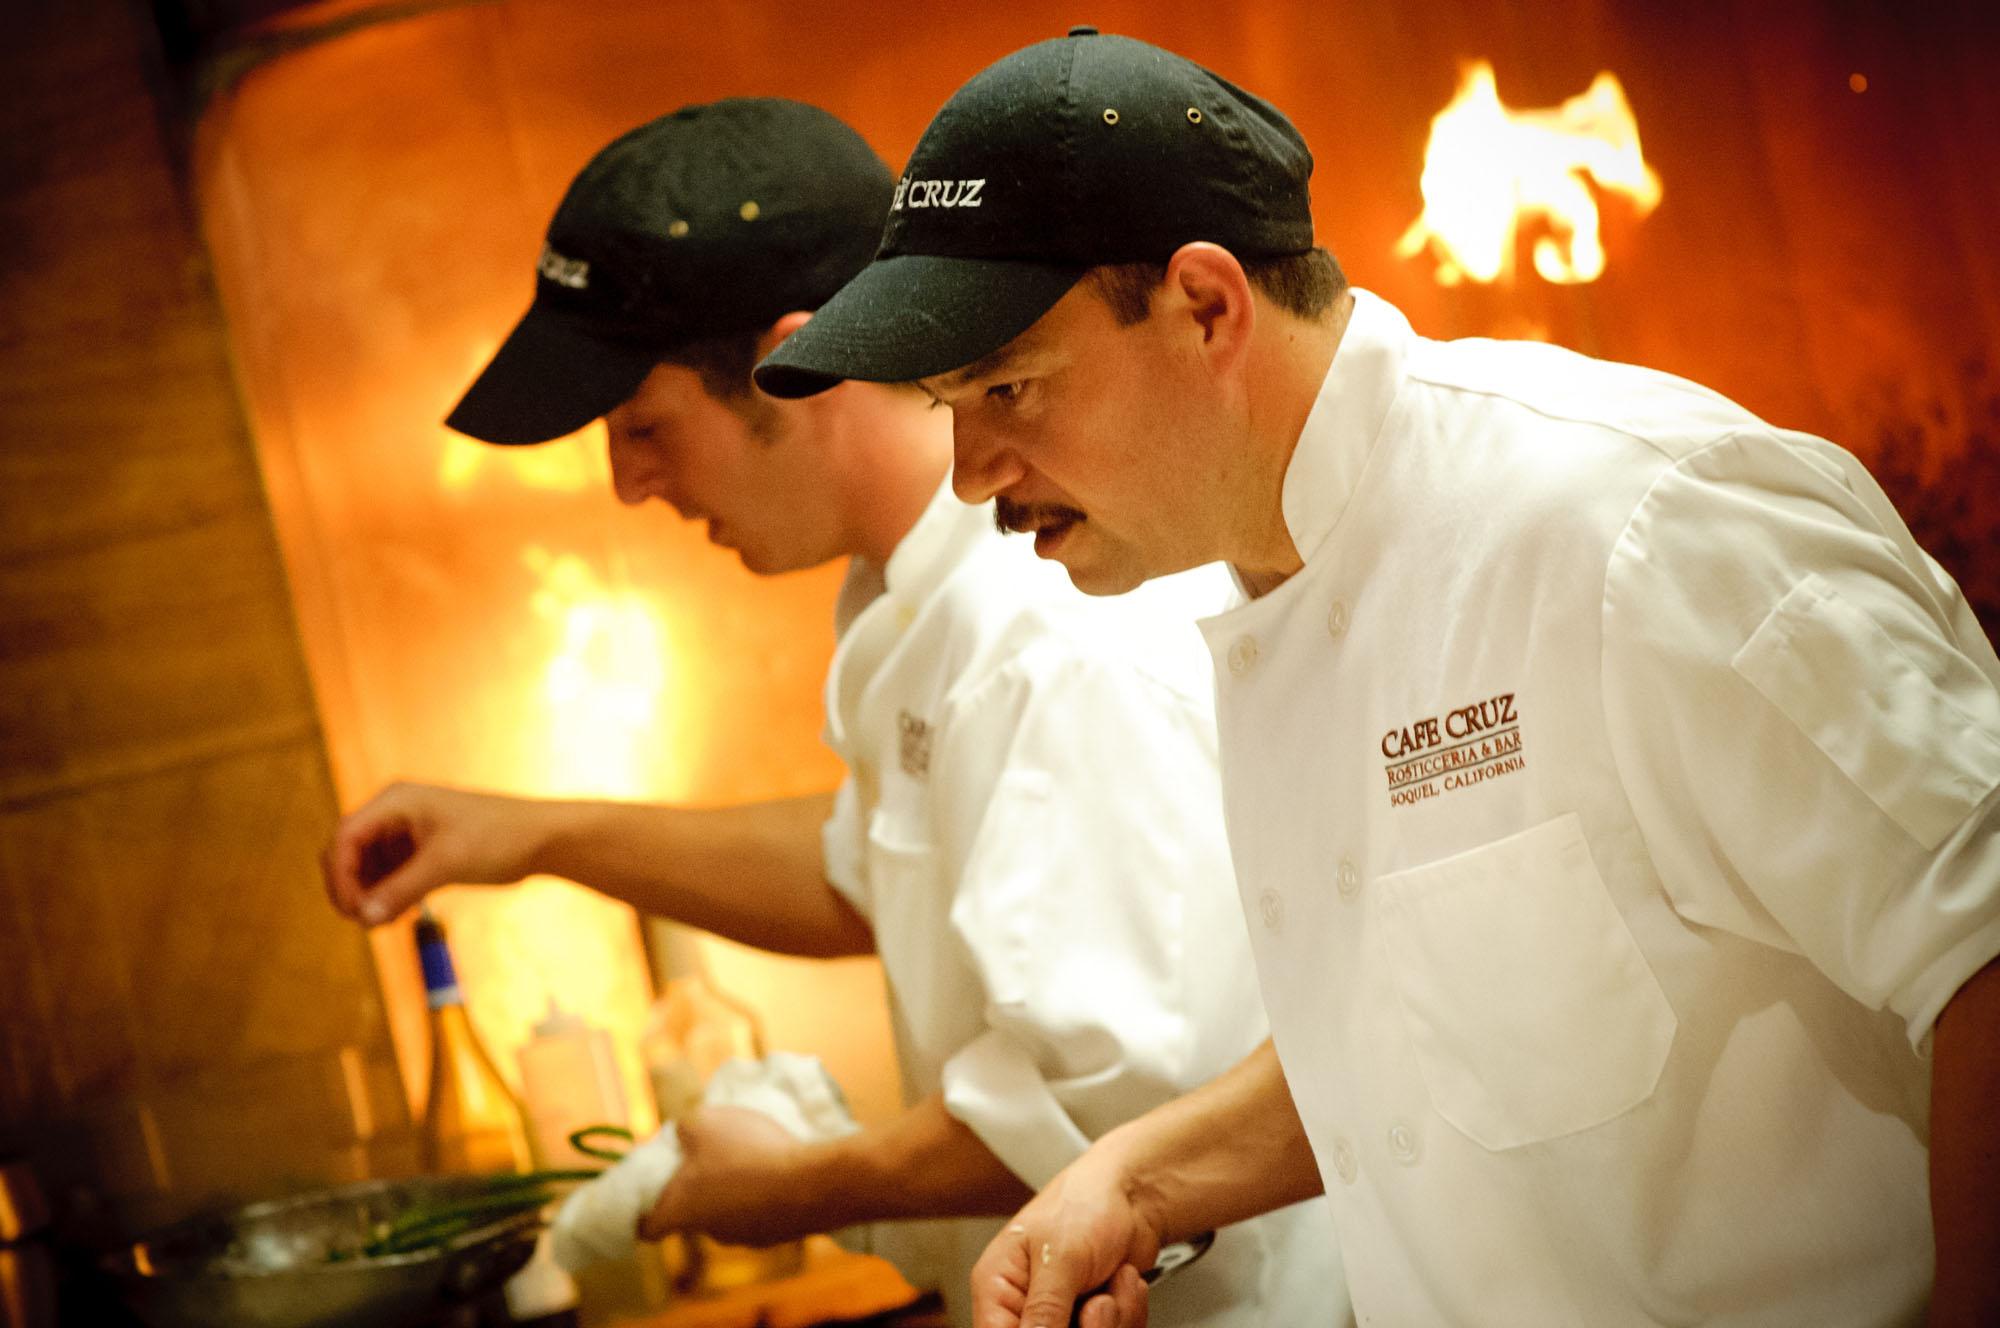 9285-d700_Cafe_Cruz_Staff_etc_Soquel_Restaurant_Photography.jpg